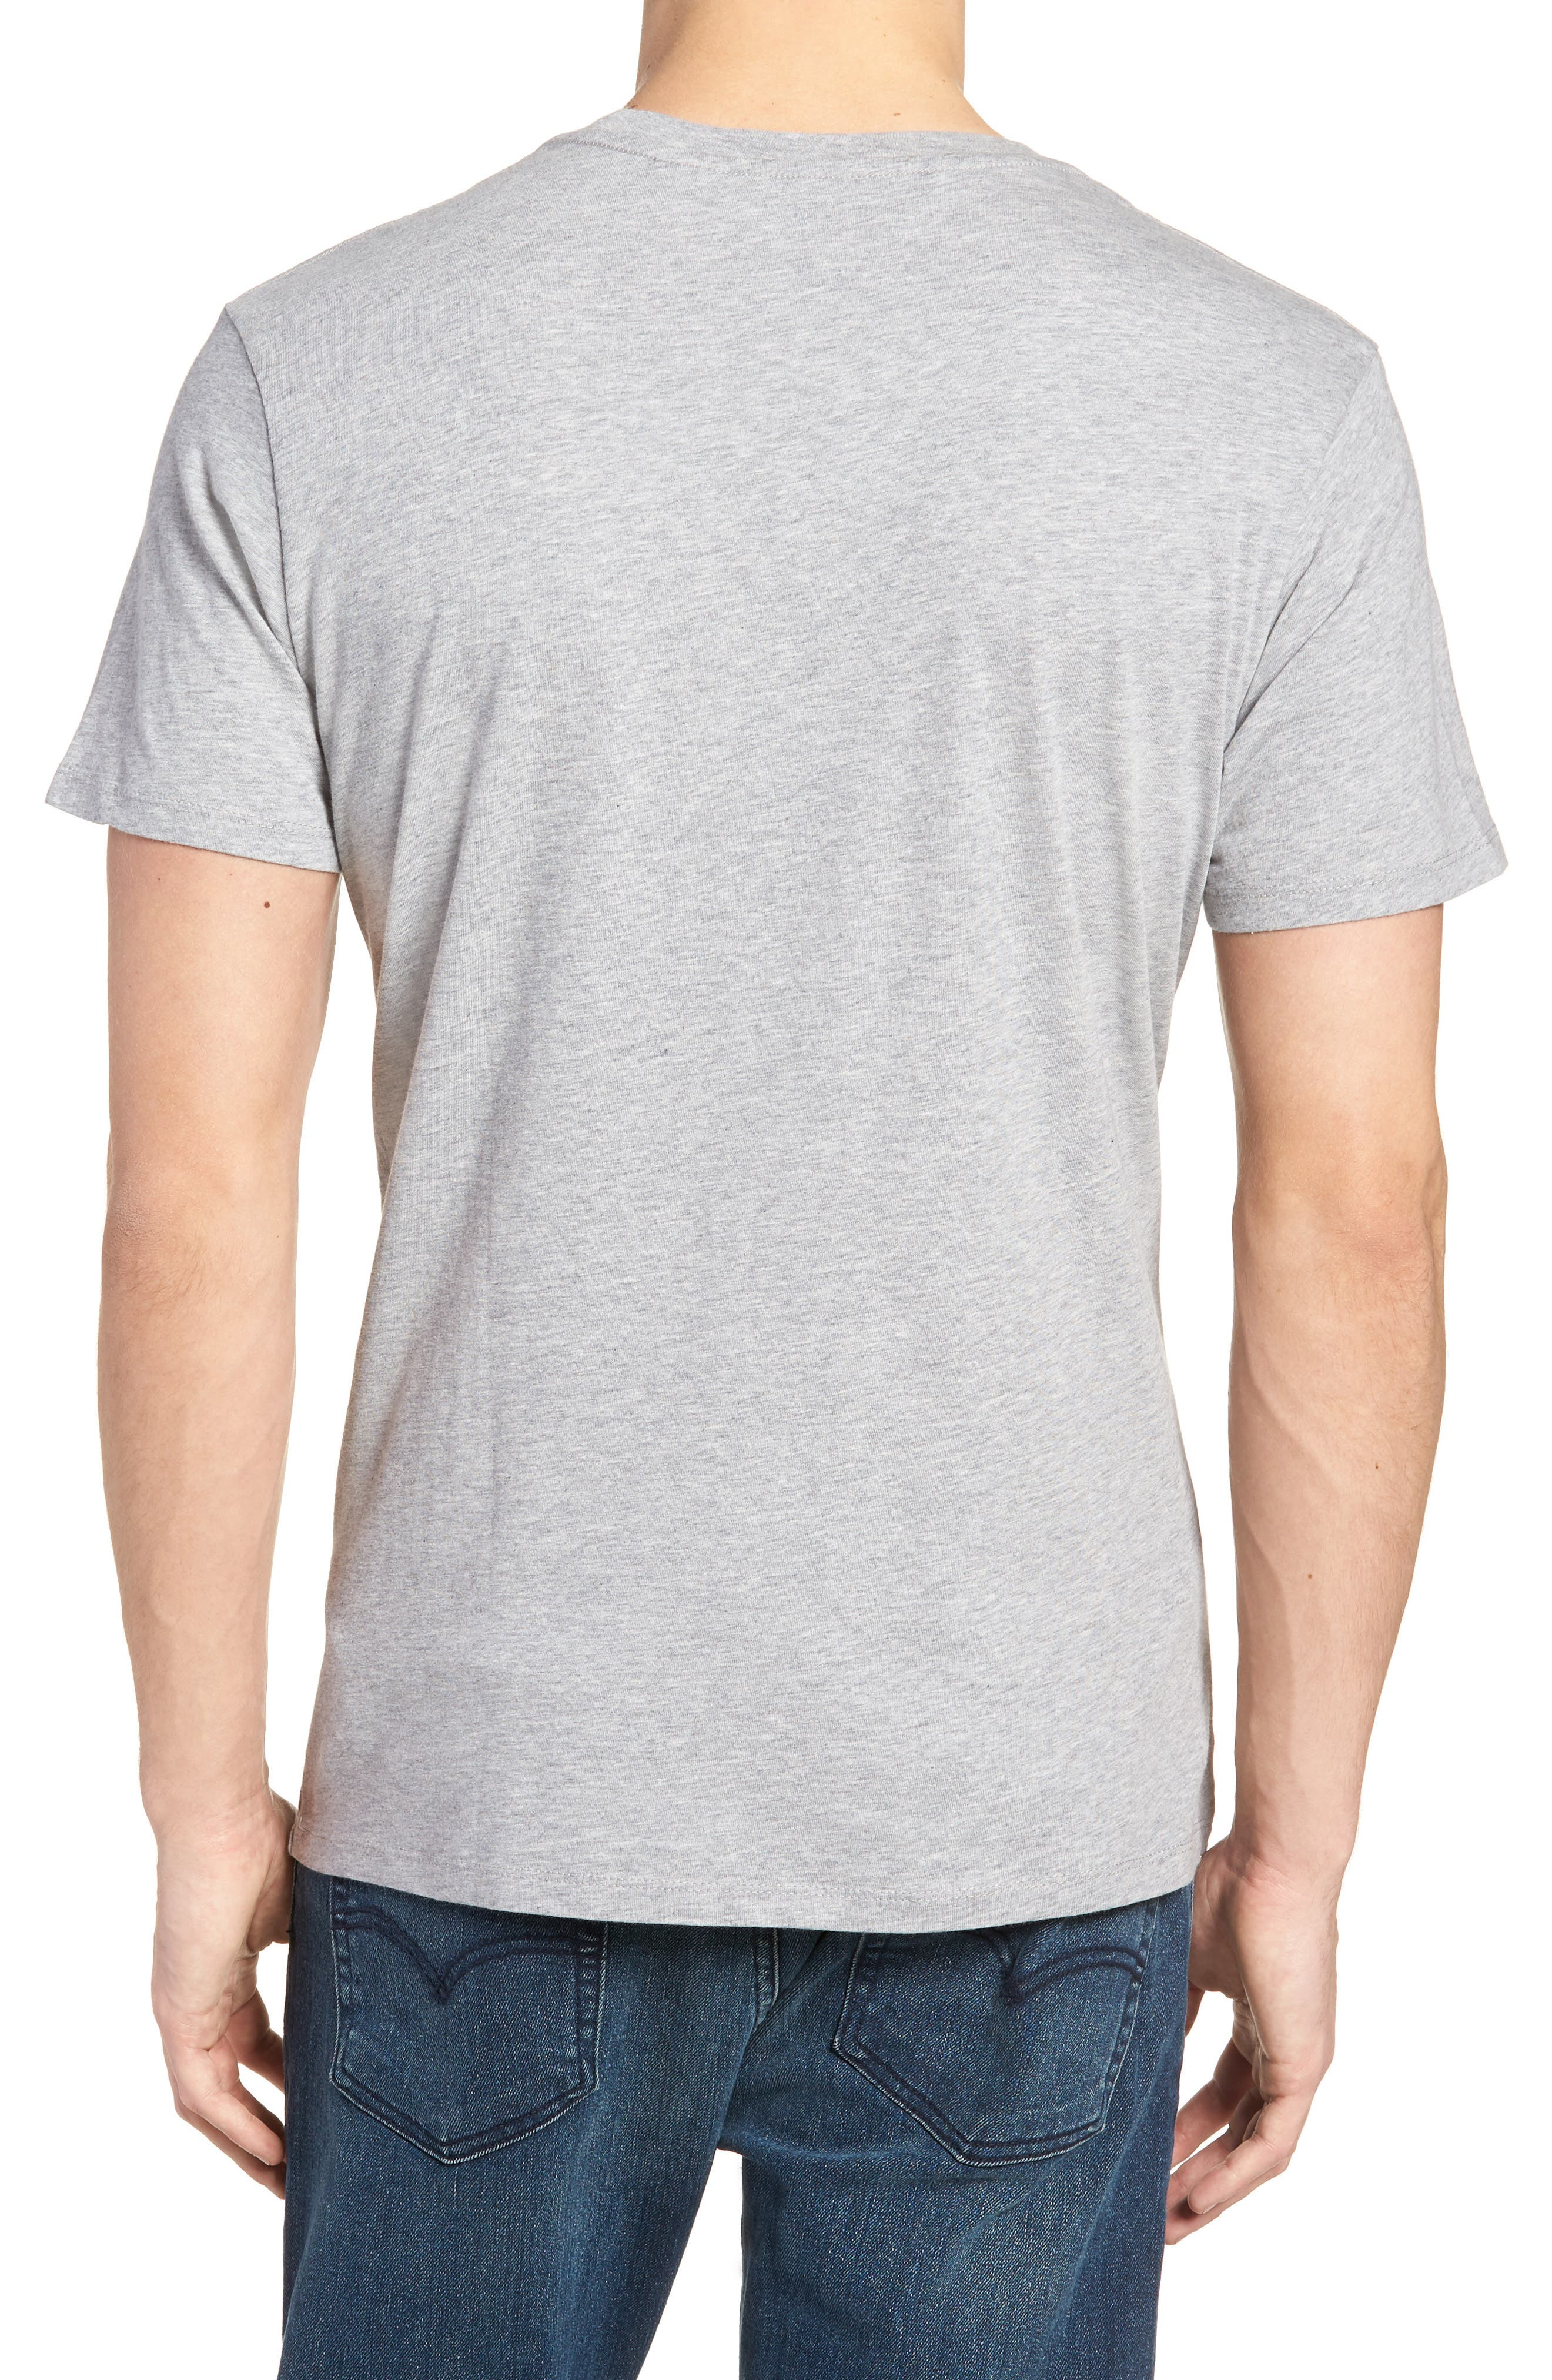 Housemark Graphic T-Shirt,                             Alternate thumbnail 2, color,                             020